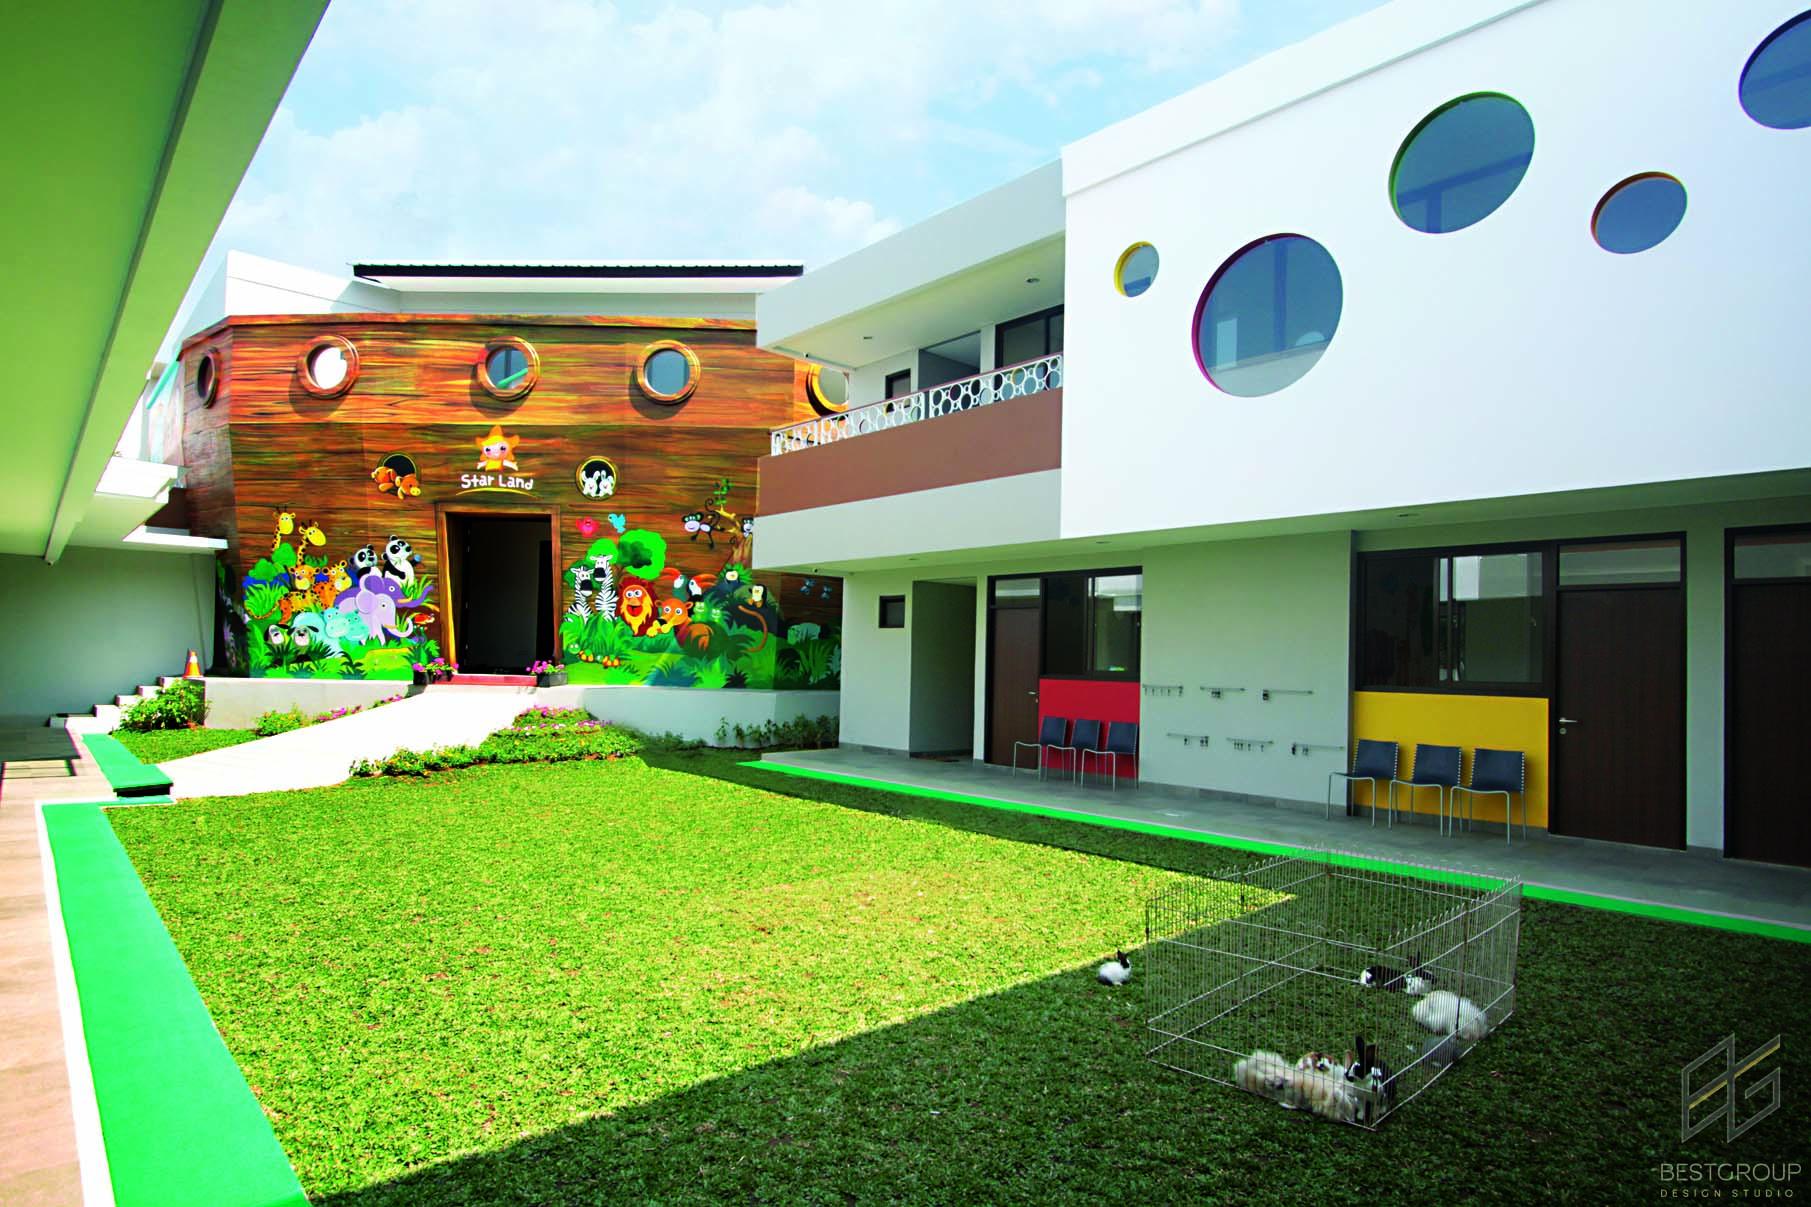 Best Group Design Studio Starland Kindergarten  Jl. Sersan Bajuri No.99, Isola, Sukasari, Kota Bandung, Jawa Barat 40154, Indonesia Jl. Sersan Bajuri No.99, Isola, Sukasari, Kota Bandung, Jawa Barat 40154, Indonesia Best-Group-Design-Studio-Starland-Kindergarten-   68401